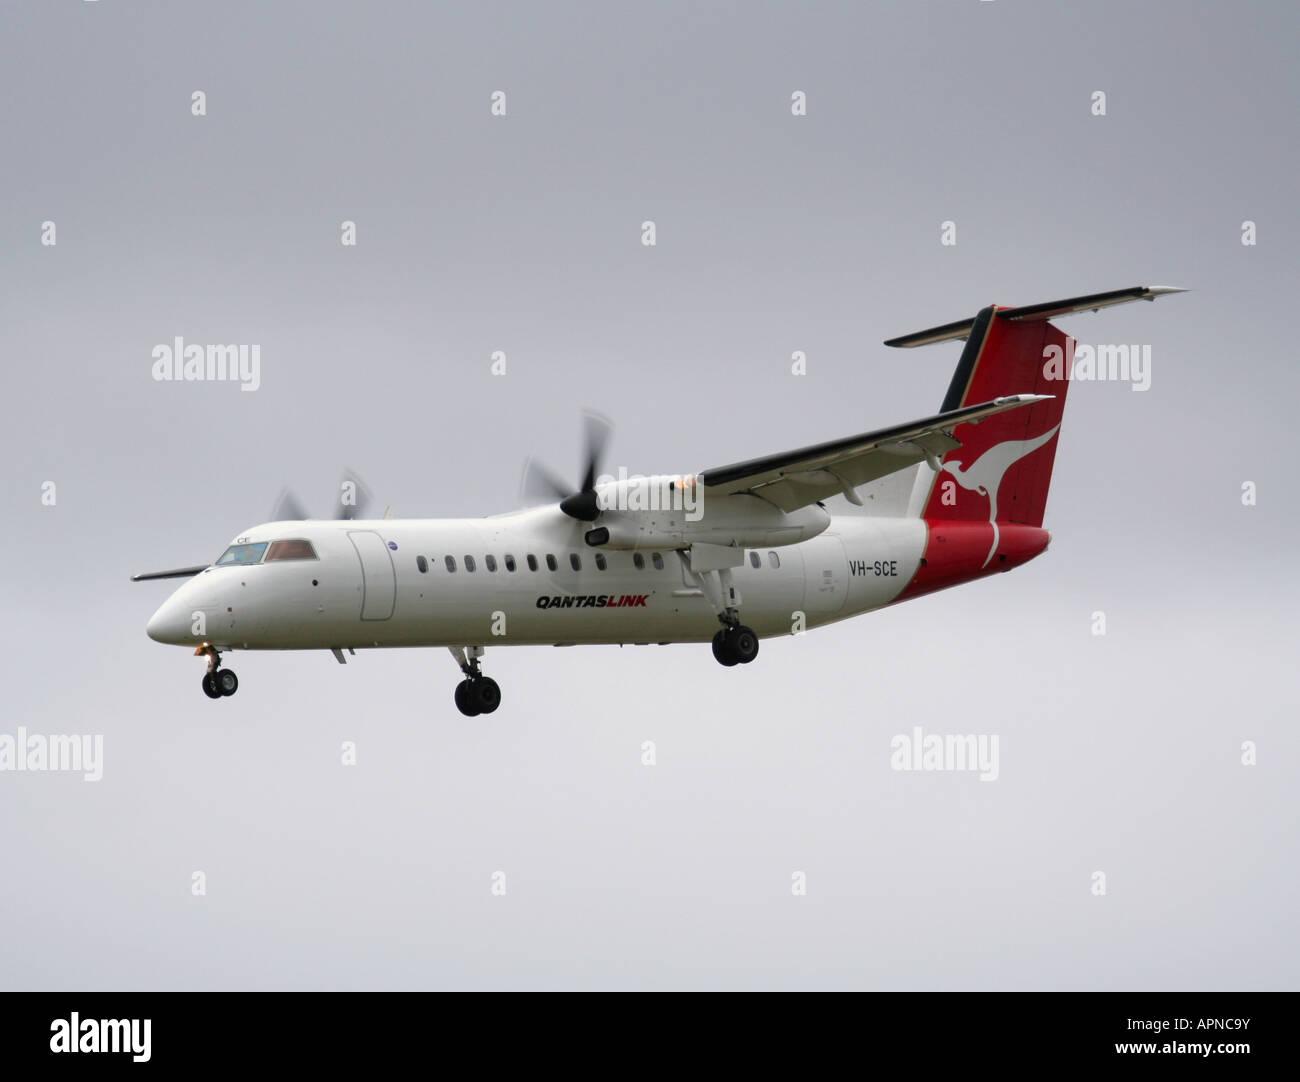 QantasLink Dash 8 turboprop airliner - Stock Image